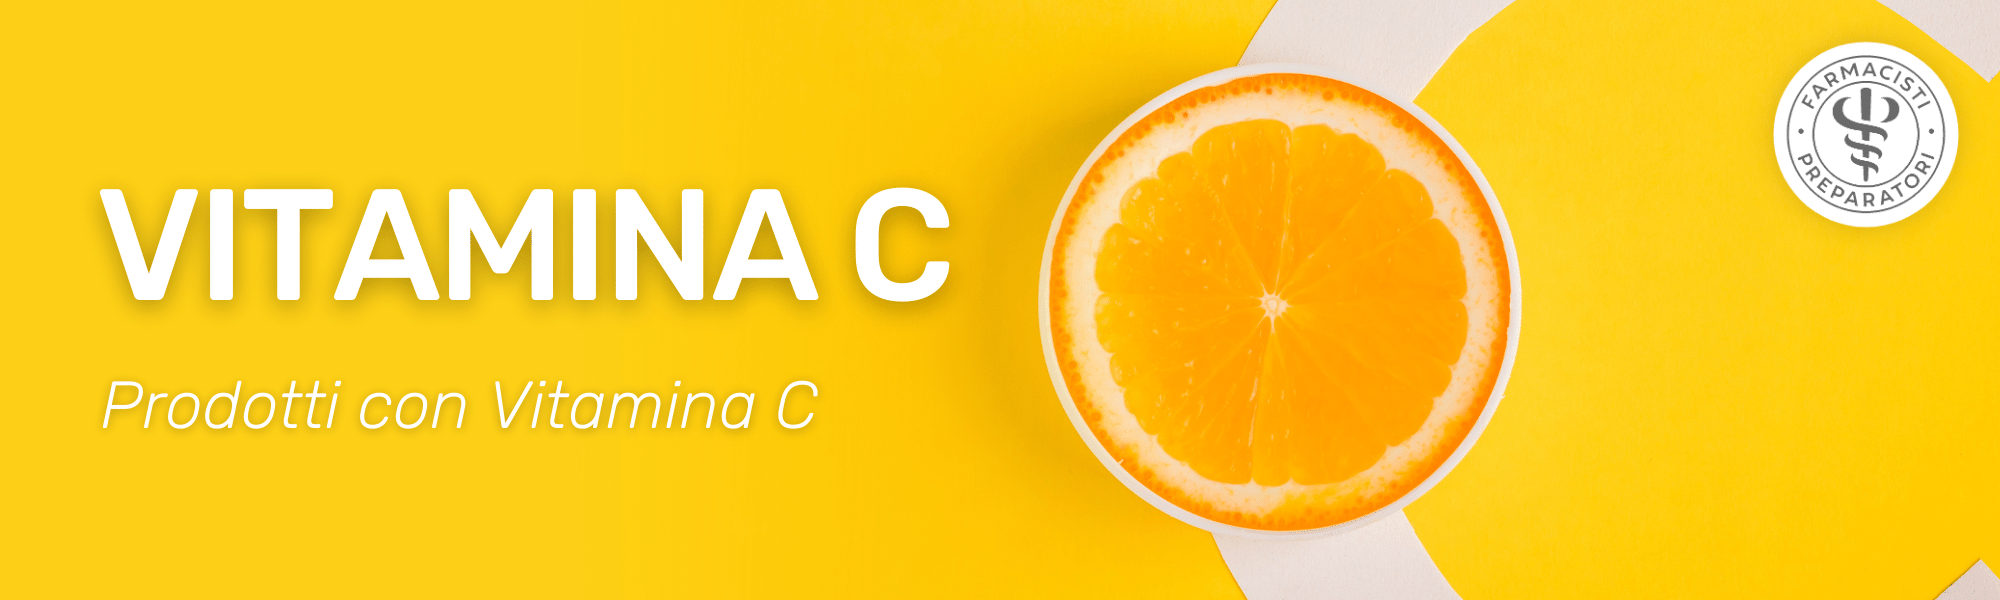 Vitamina C Farmacisti Preparatori